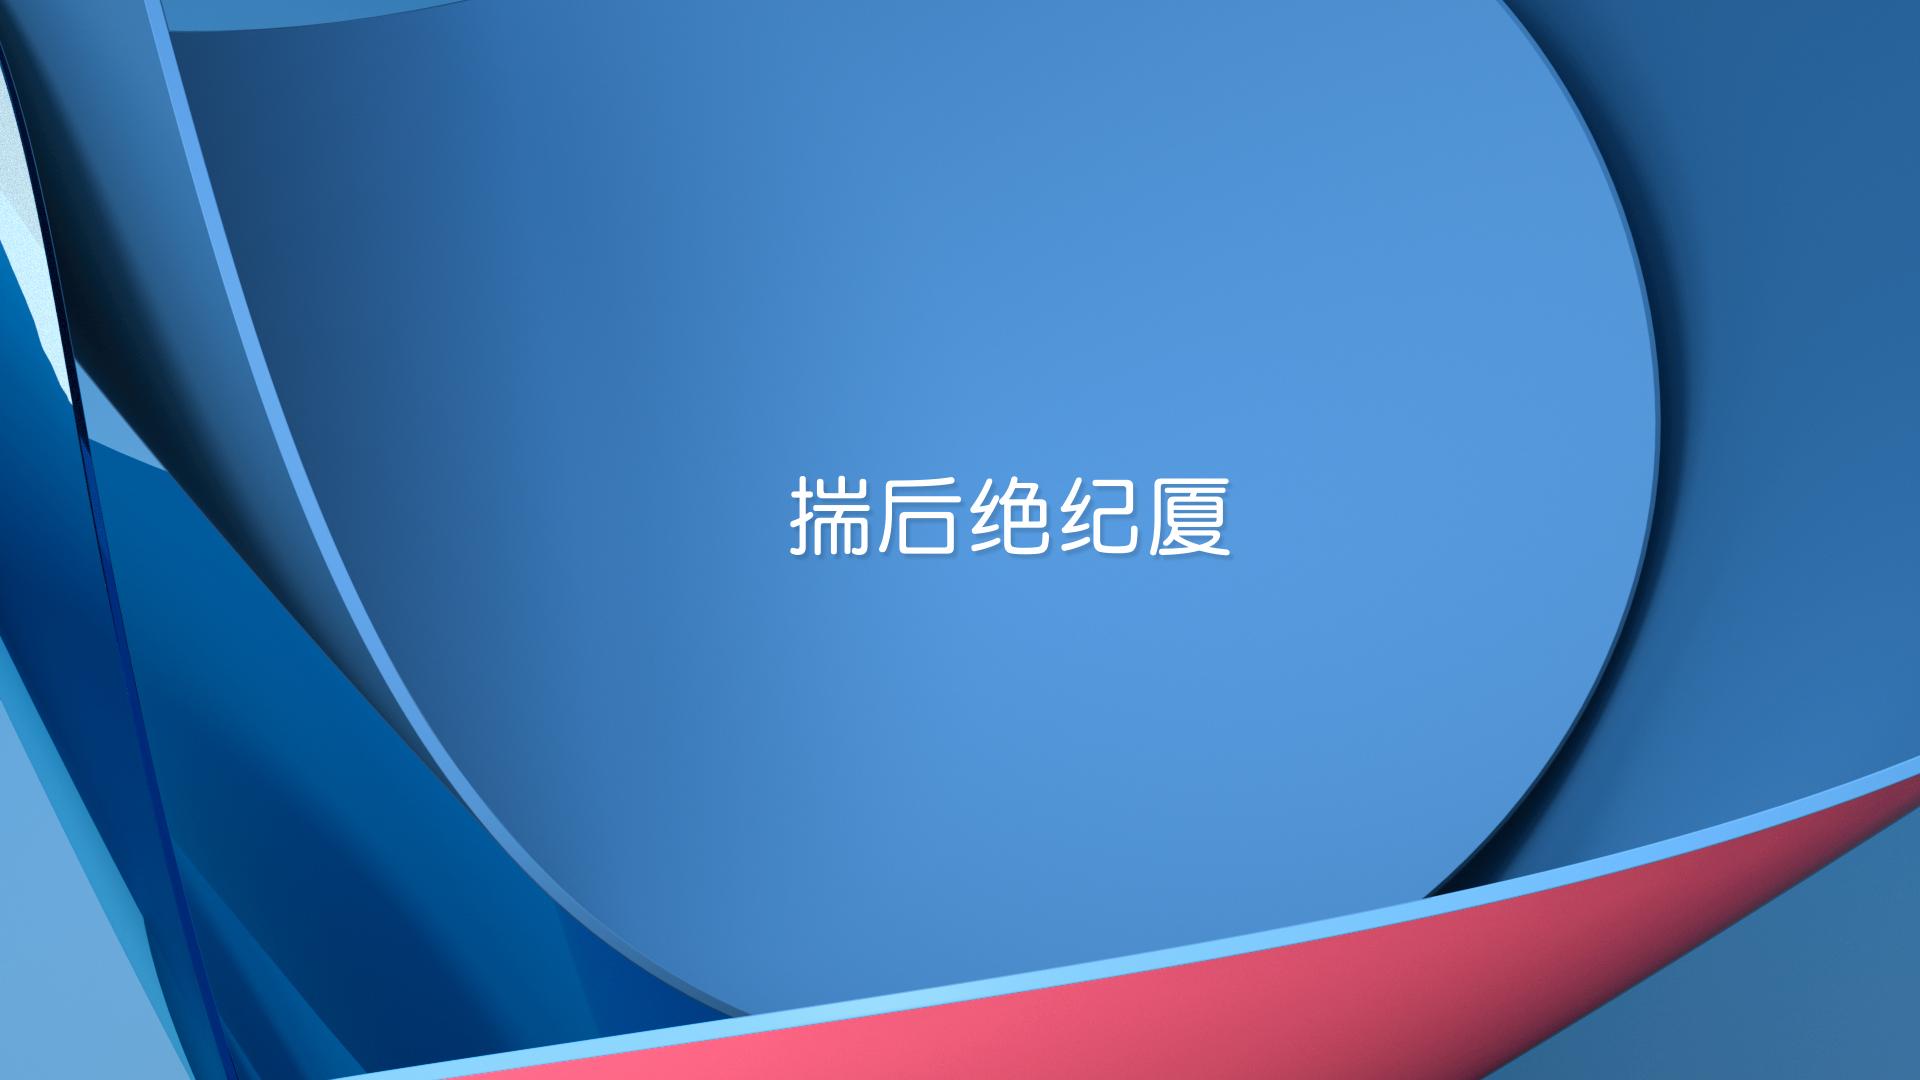 009A_05_ThematicOpener_Background (00000).jpg